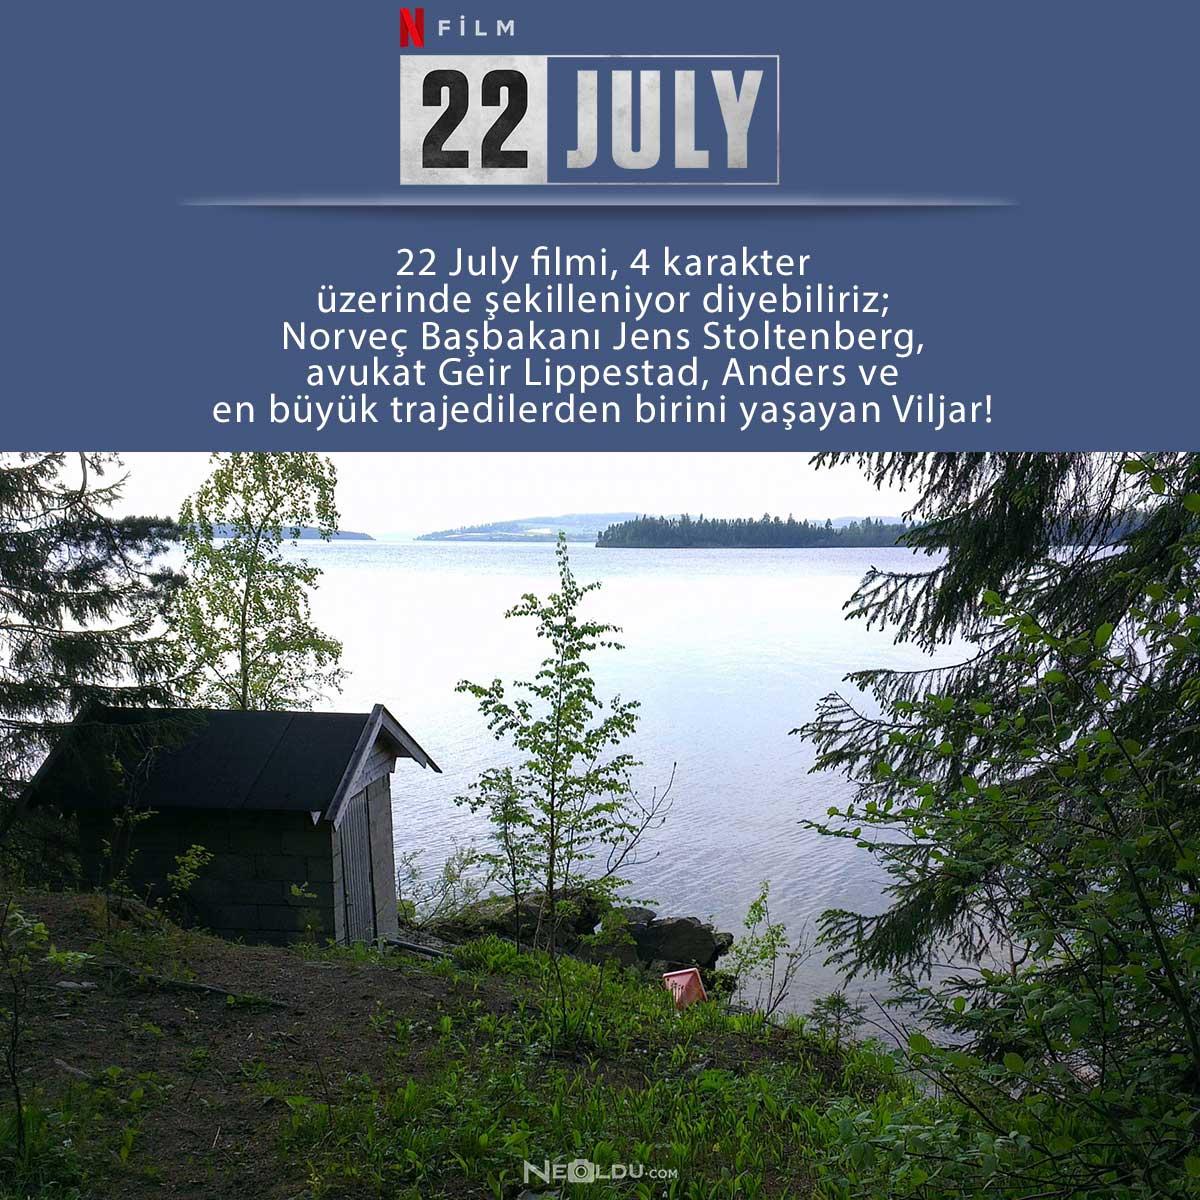 22-july-filmi-hakkinda-.jpg